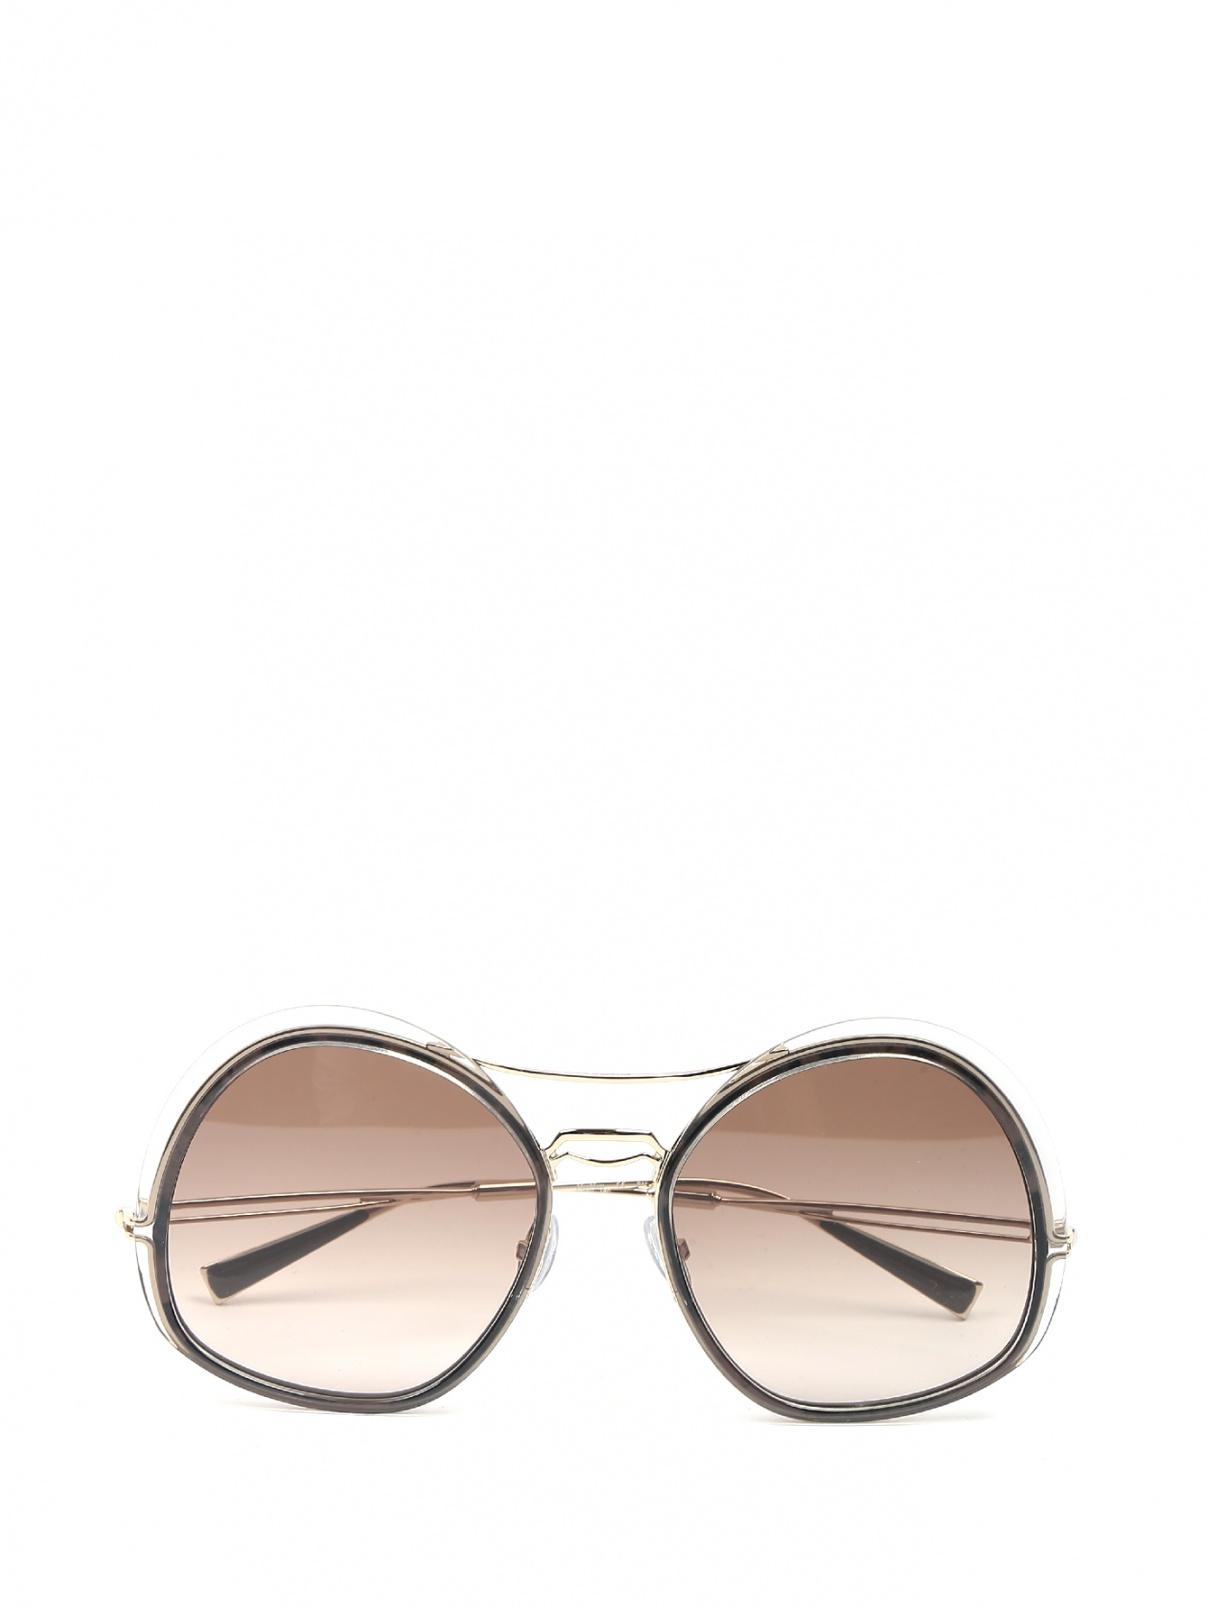 Очки солнцезащитные из пластика и металла Max Mara  –  Общий вид